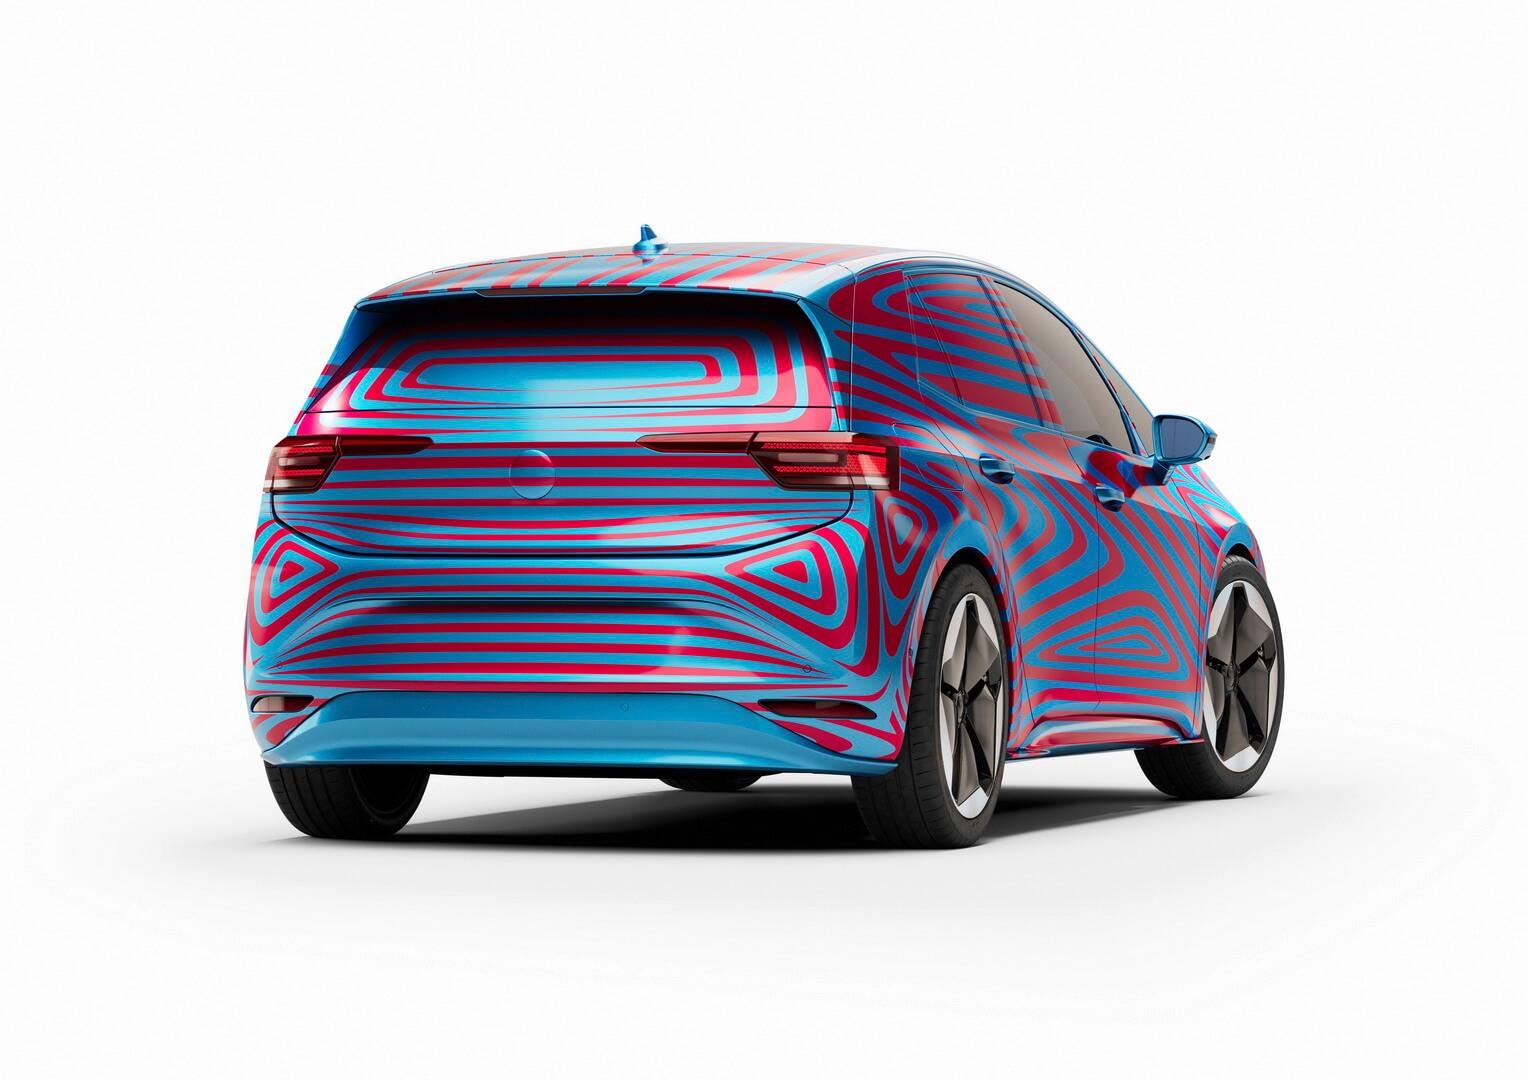 Электрический хэтчбек Volkswagen ID.3 - фото 3